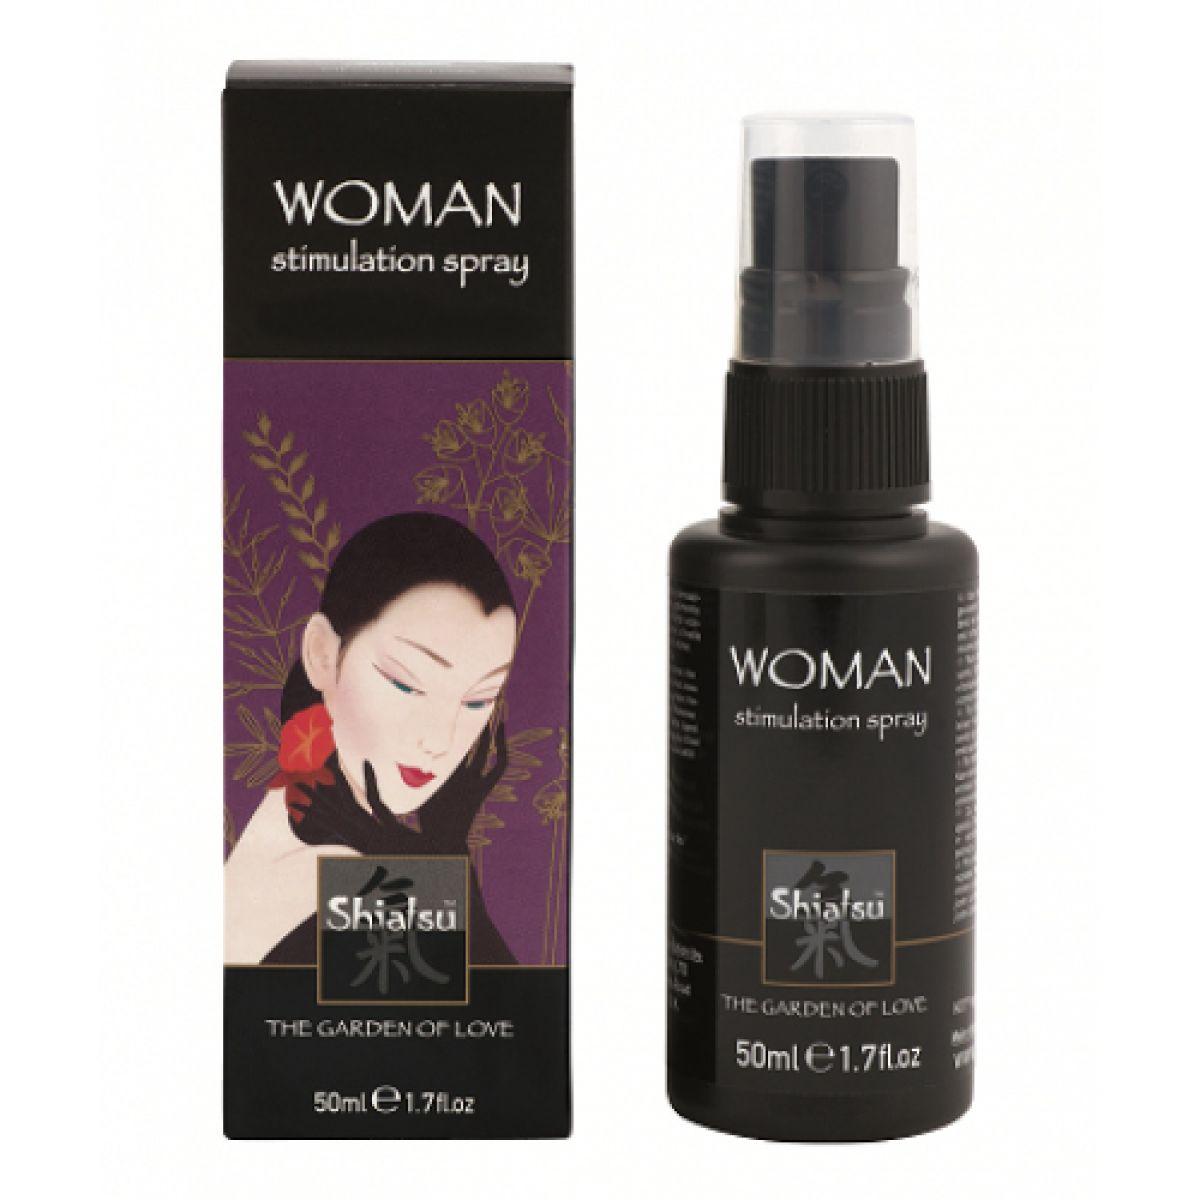 Стимулирующий спрей для женщин 50 мл Shiatsu